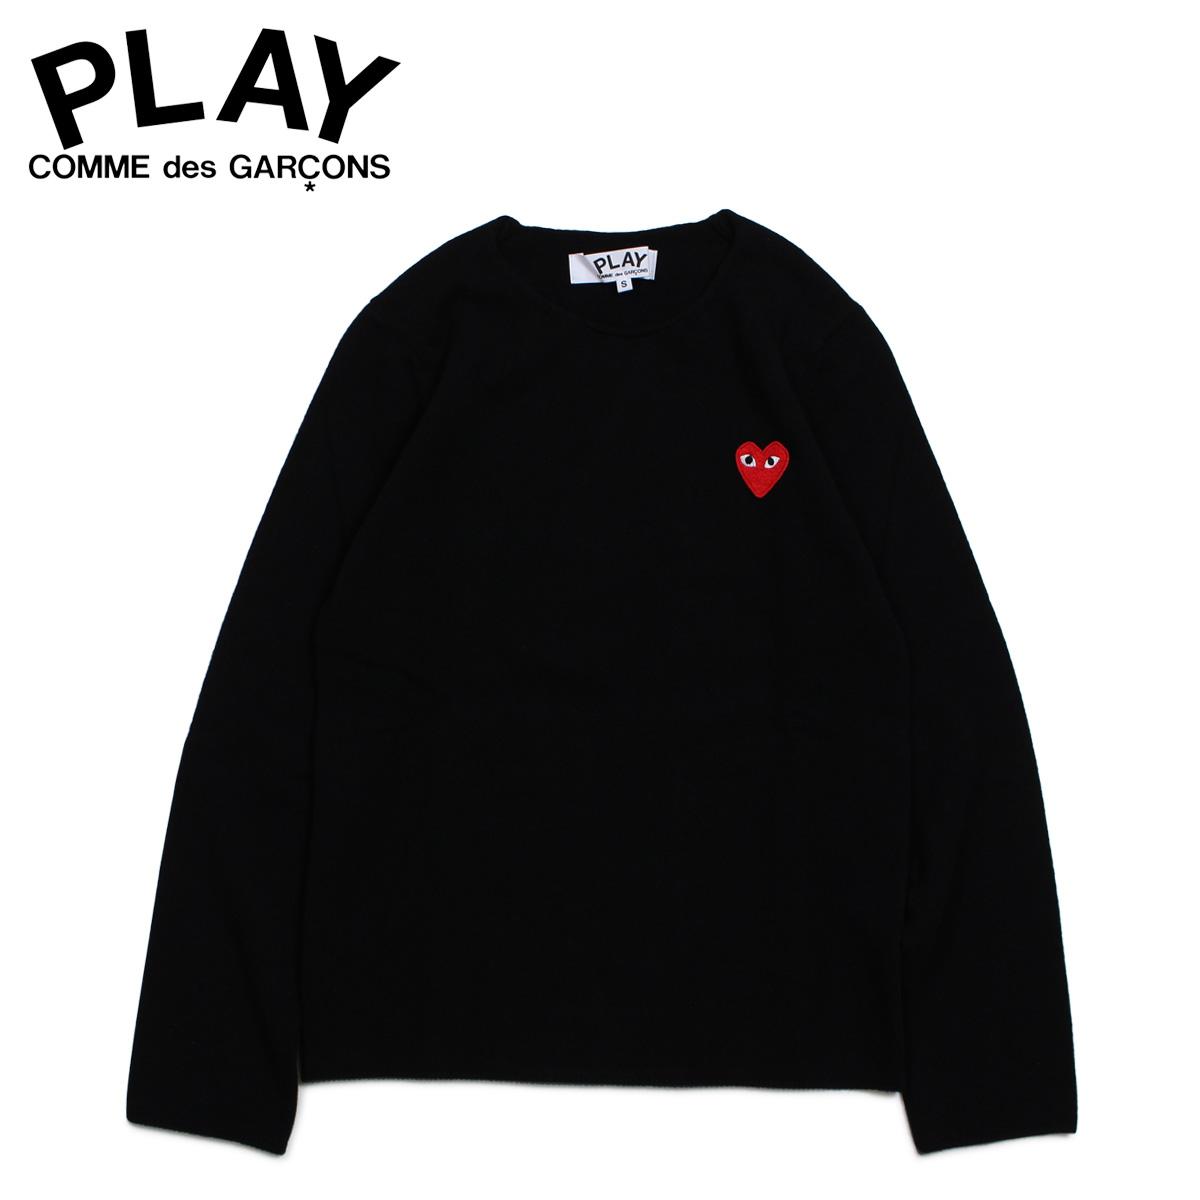 PLAY COMME des GARCONS RED HEART CREW NECK SWEATER コムデギャルソン ニット セーター レディース ブラック 黒 AZ-N067 [4/1 新入荷]